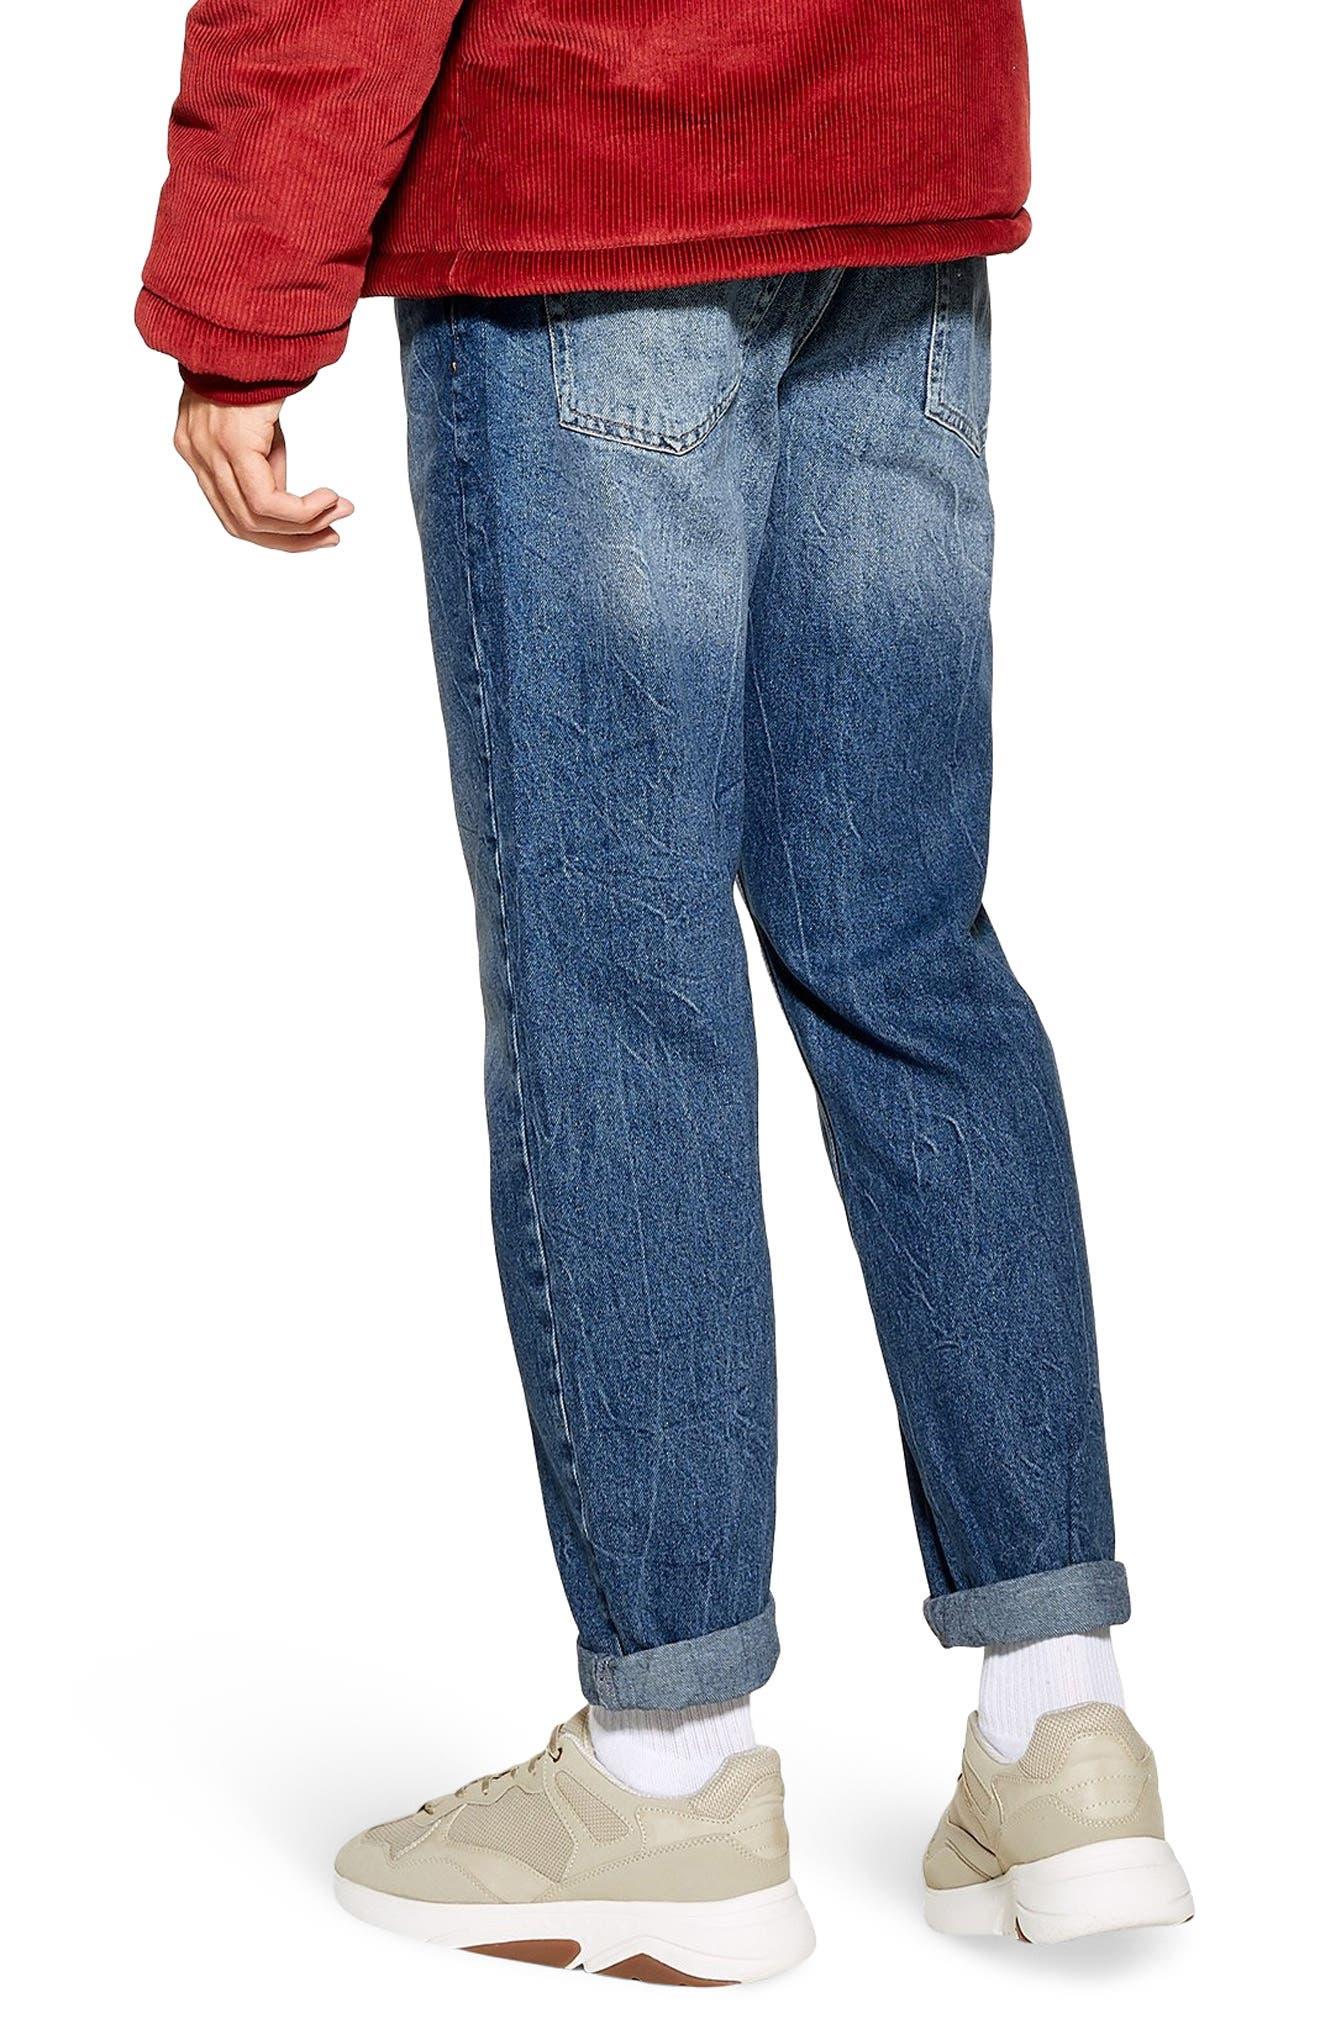 TOPMAN, Billy Original Fit Jeans, Alternate thumbnail 2, color, BLUE